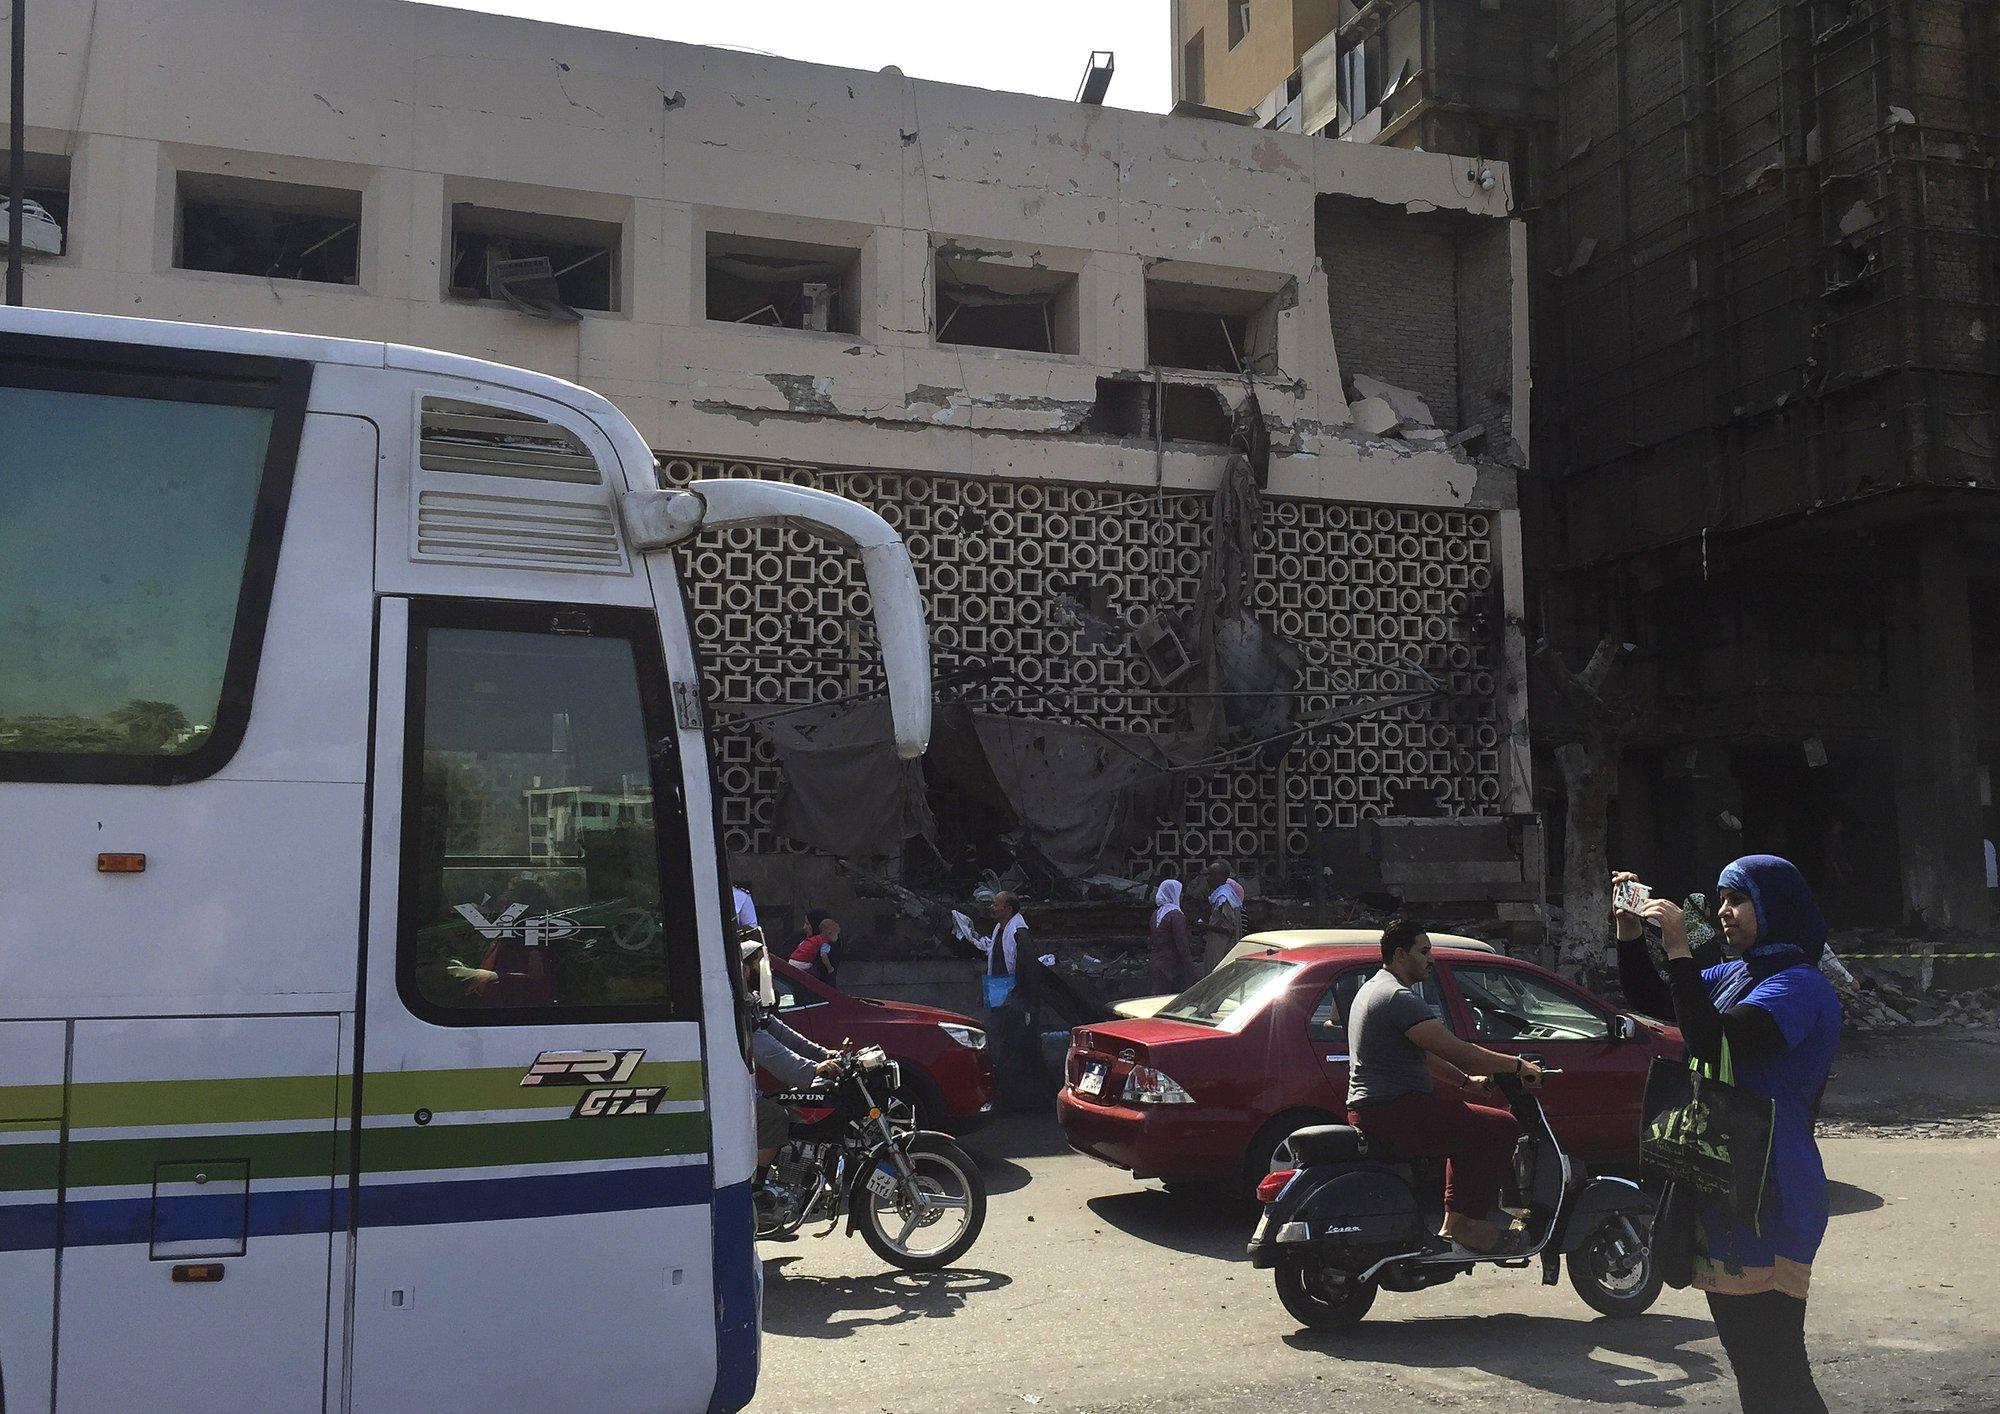 Egypt says security forces killed 17 Islamic militants